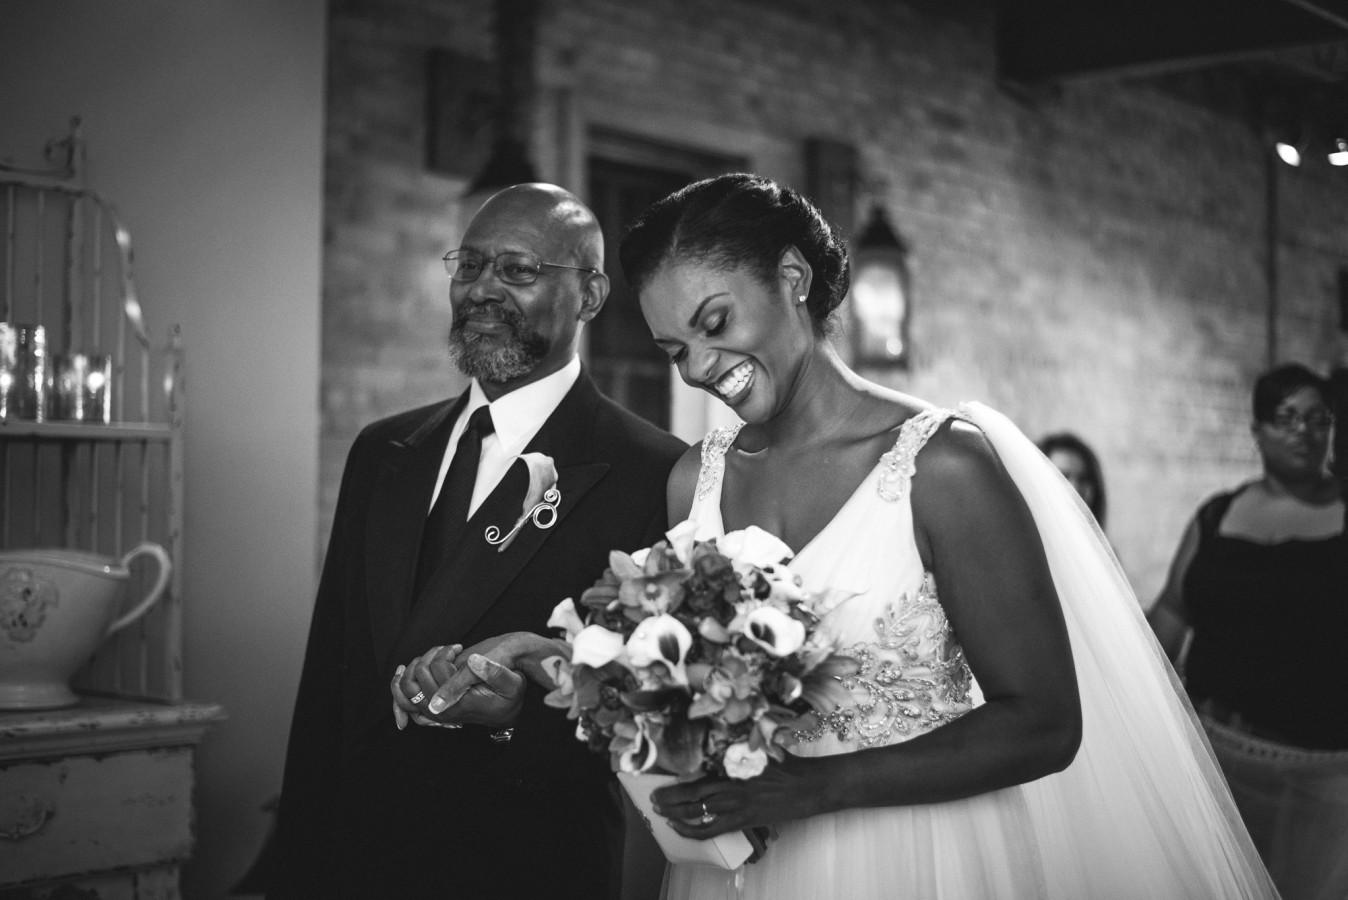 fete-photography-weddings-006